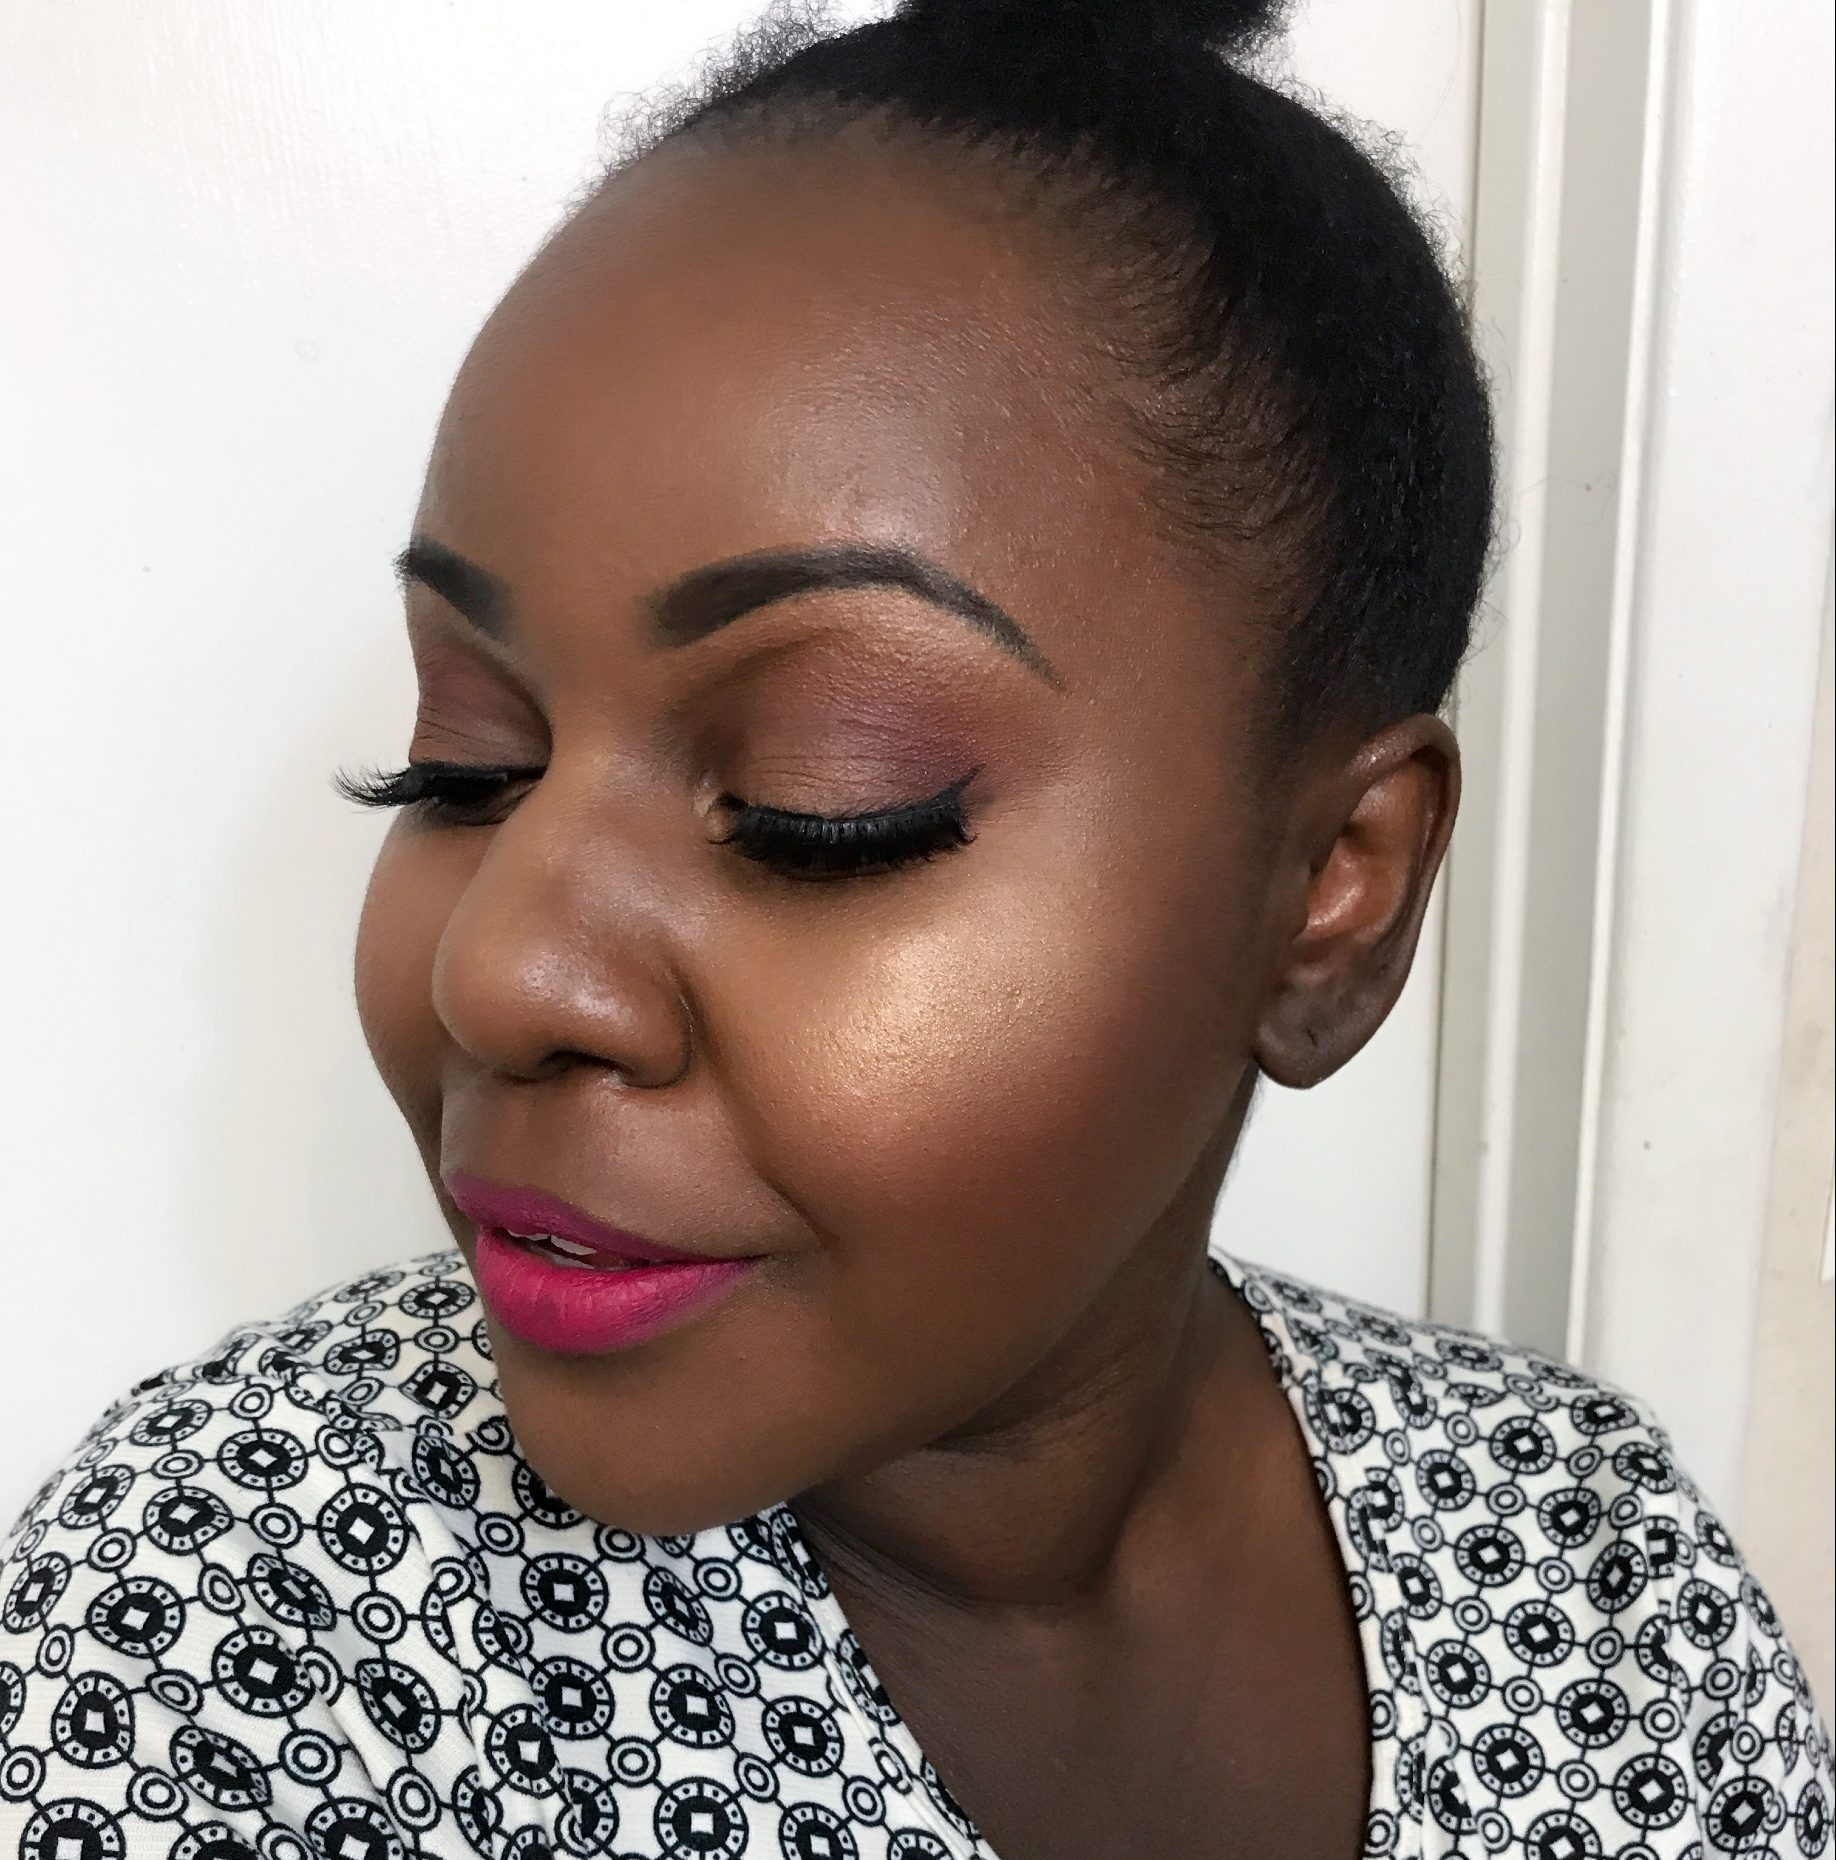 Smashbox Studio Skin Face Shaping Foundation Stick contouring dark skin